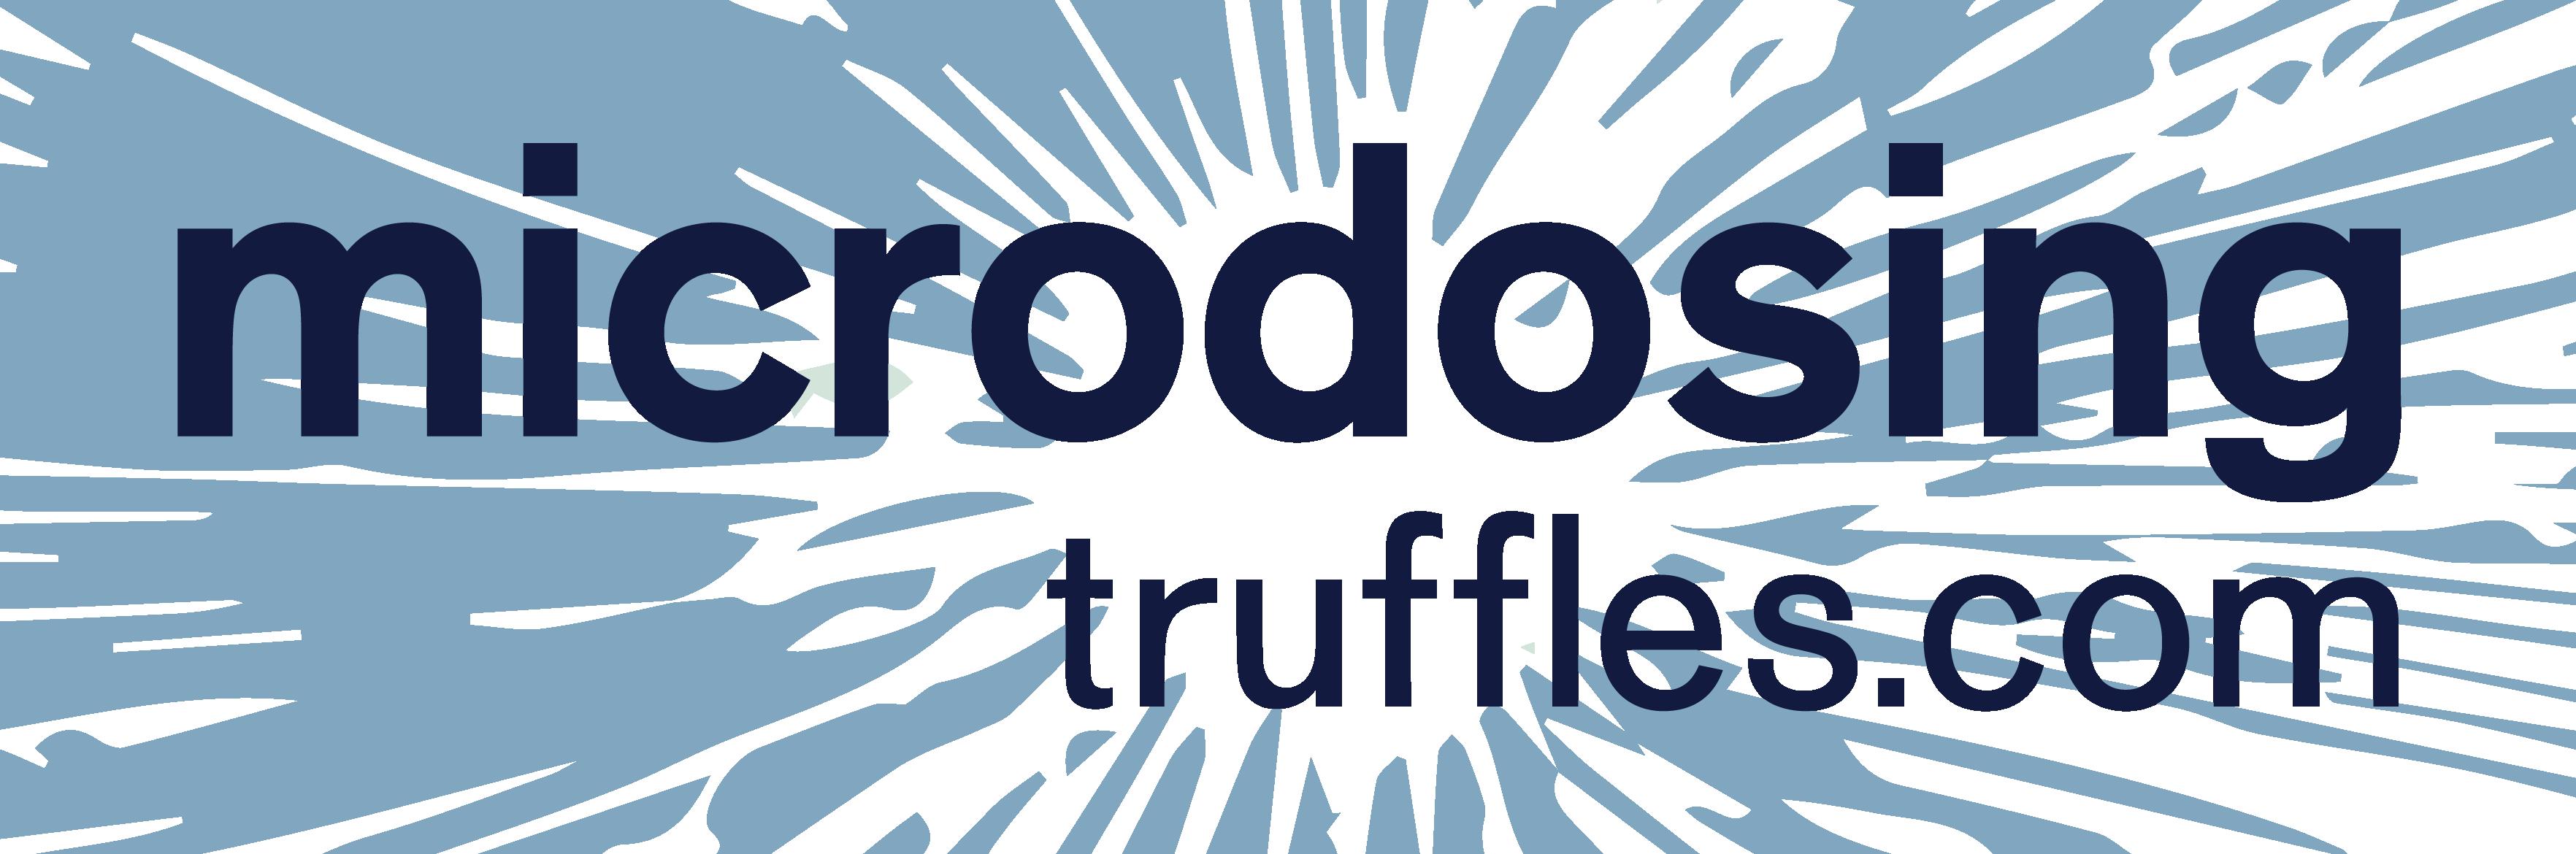 Microdosing truffles